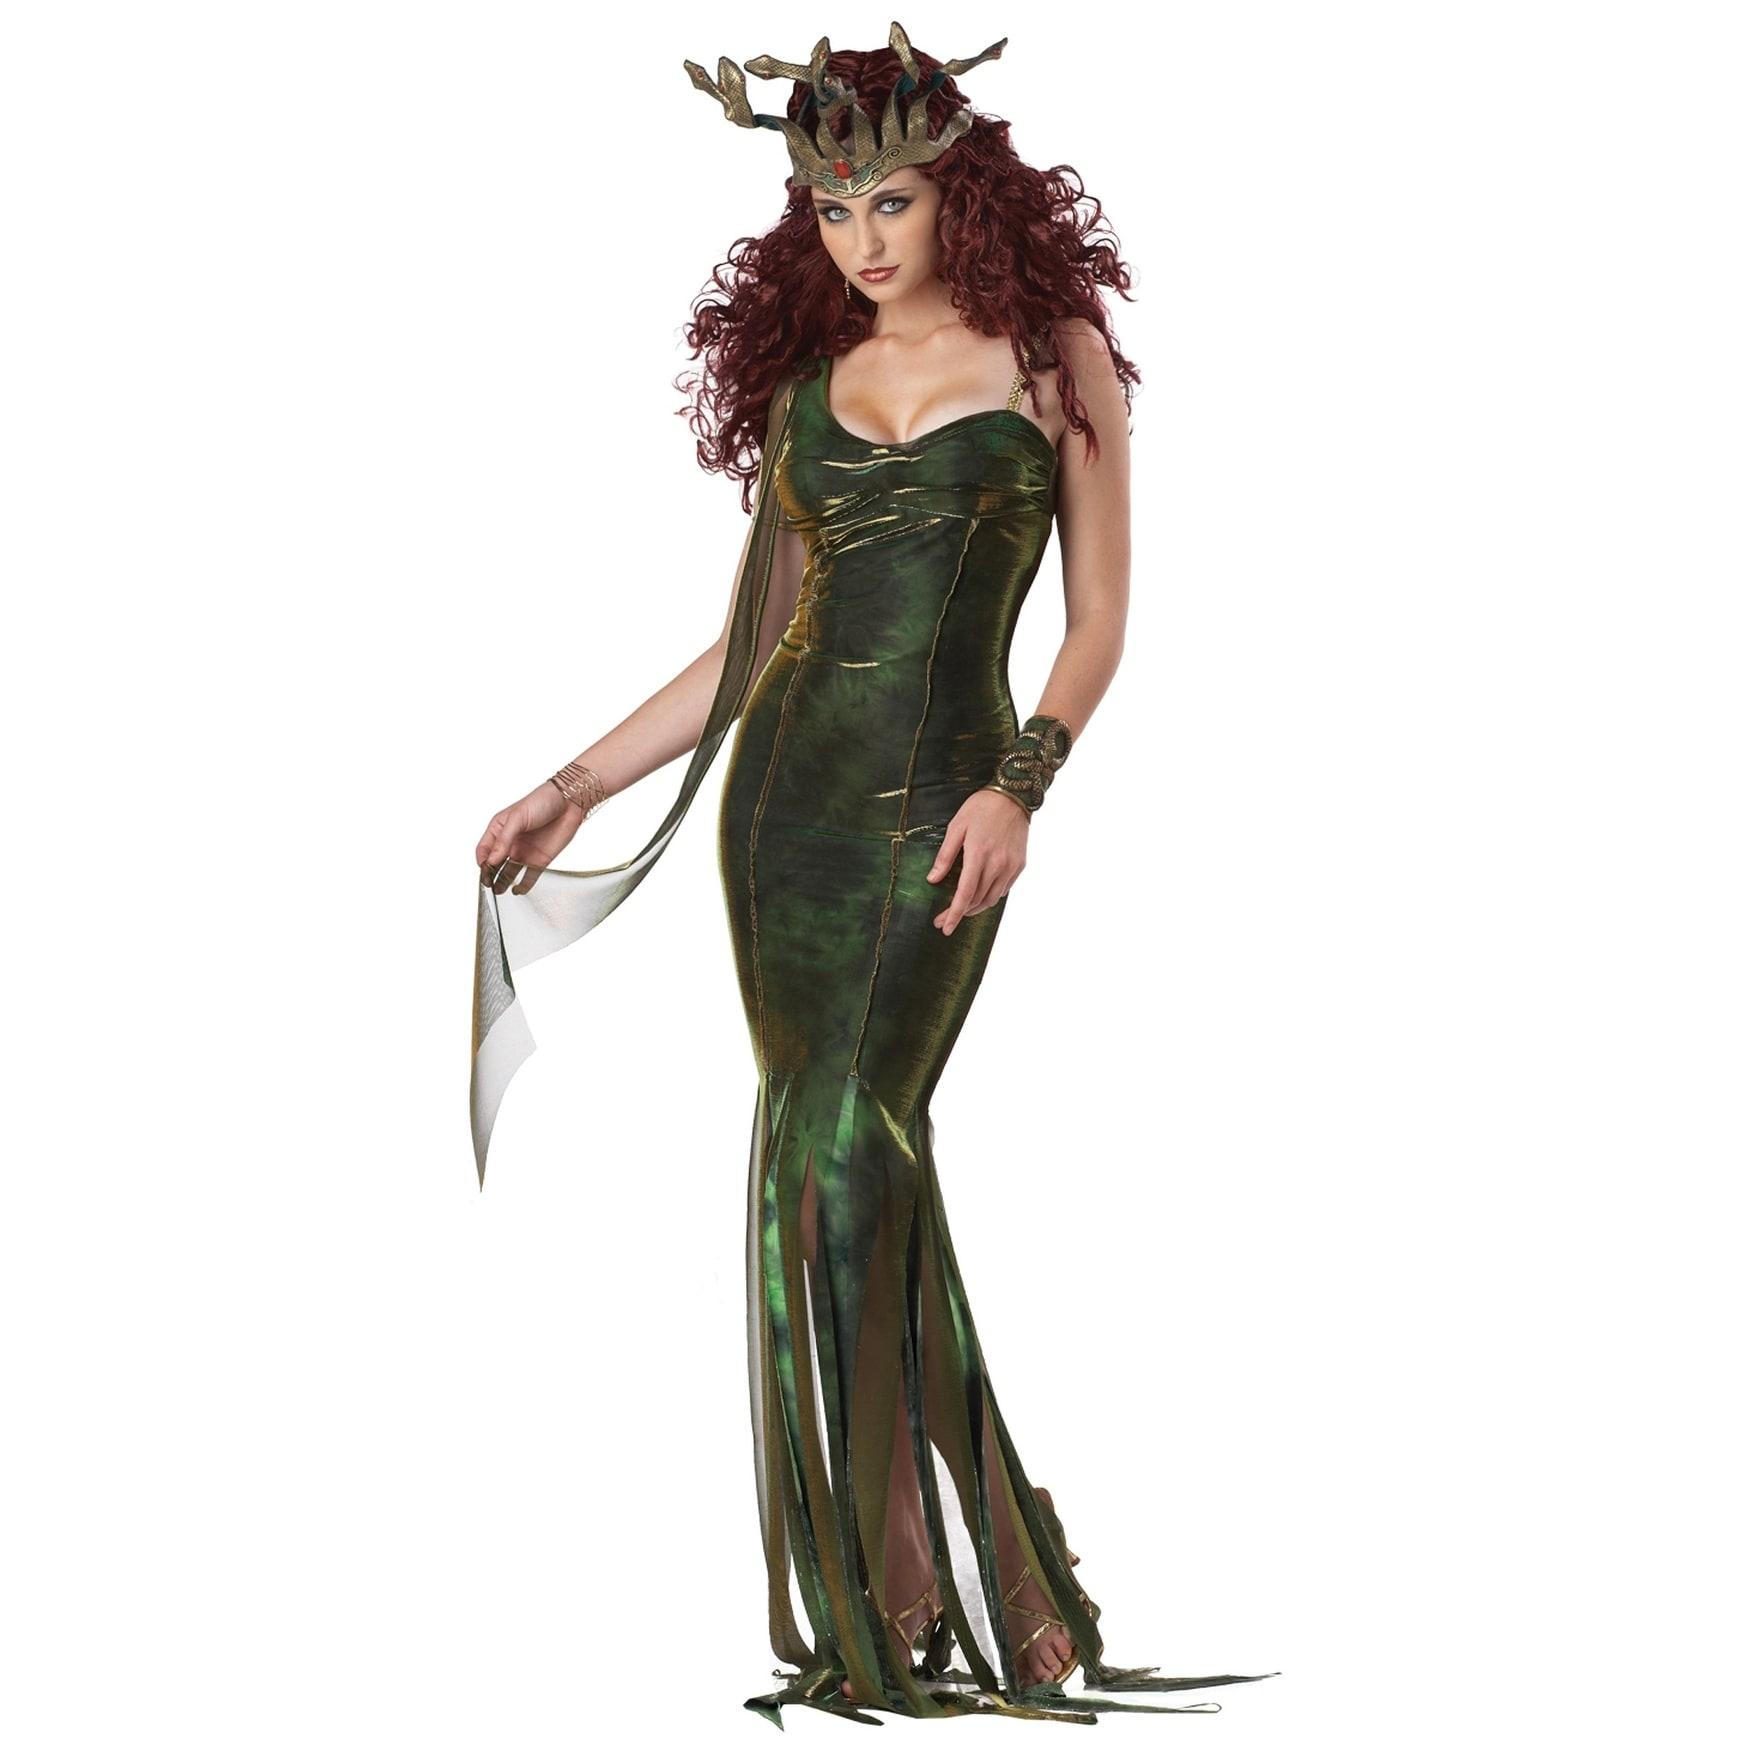 90's Porn Film Medusa Goddess serpentine goddess costume